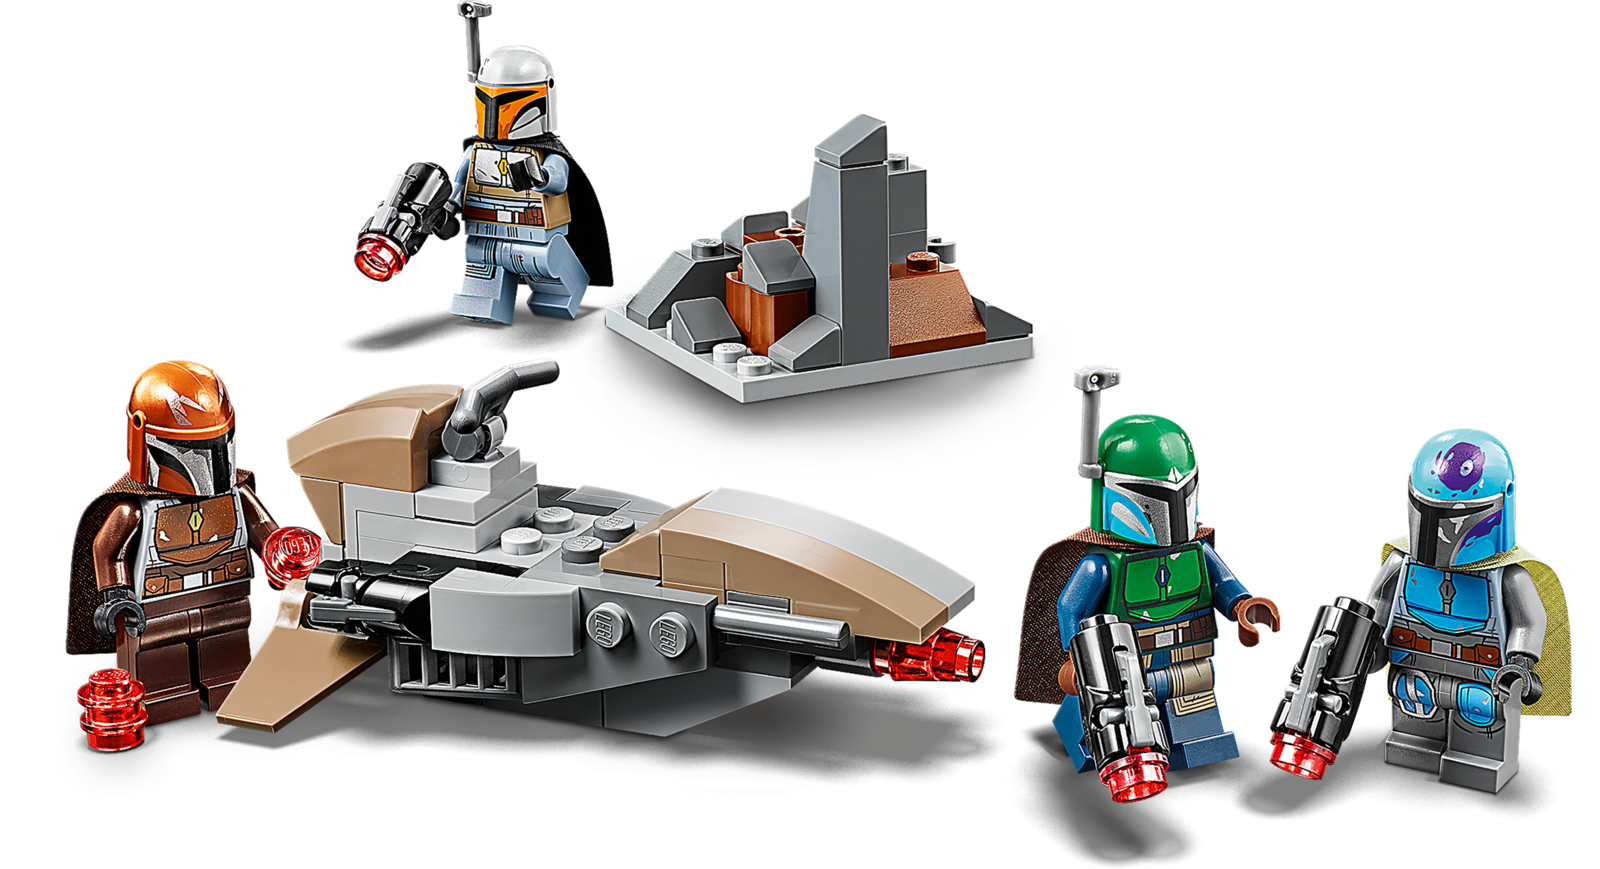 LEGO Star Wars - Mandalorian Battle Pack image